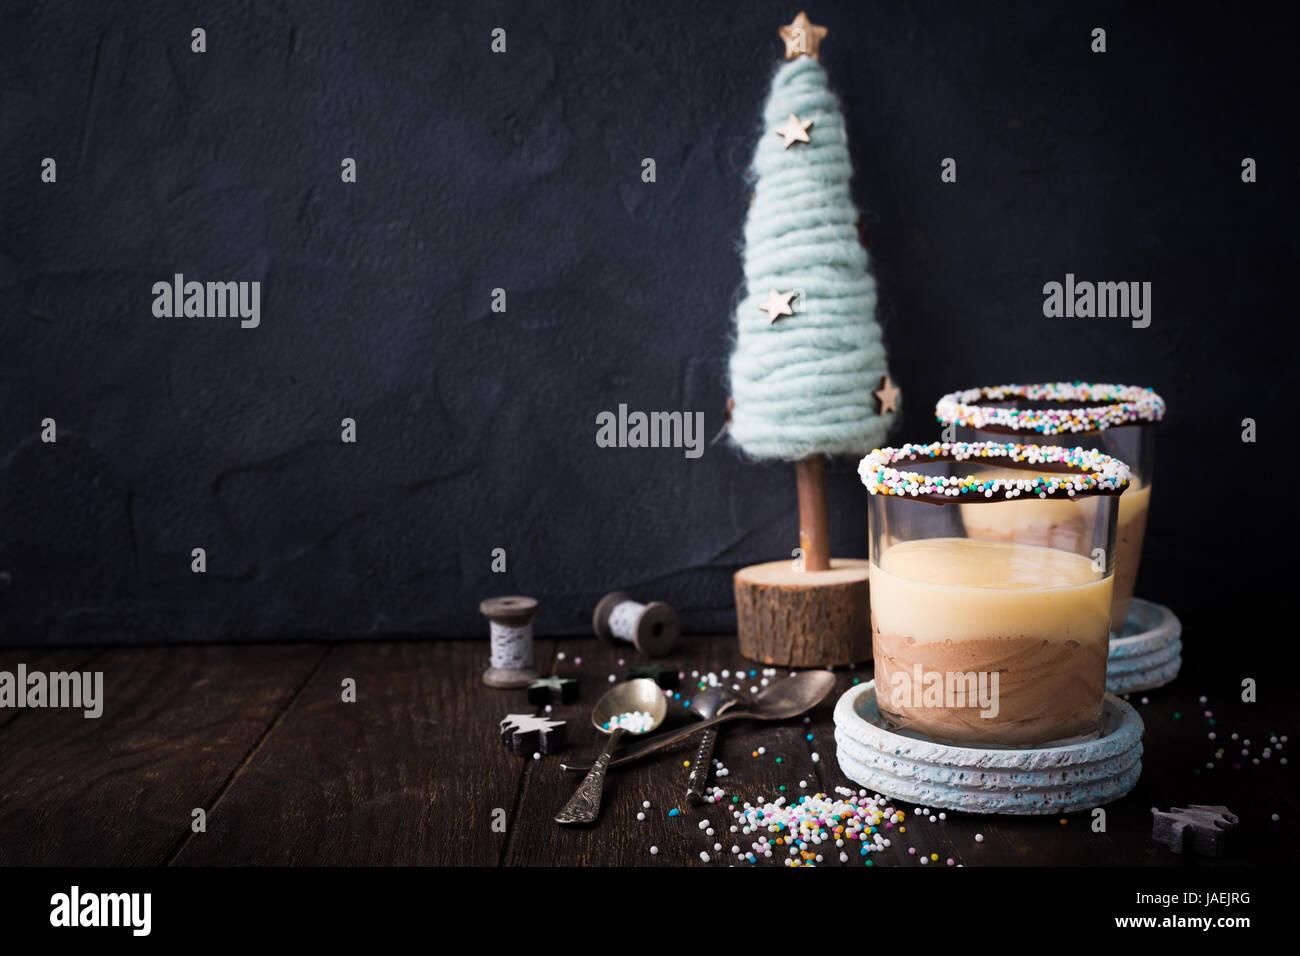 Dessert au chocolat avec crème anglaise. Photo Stock